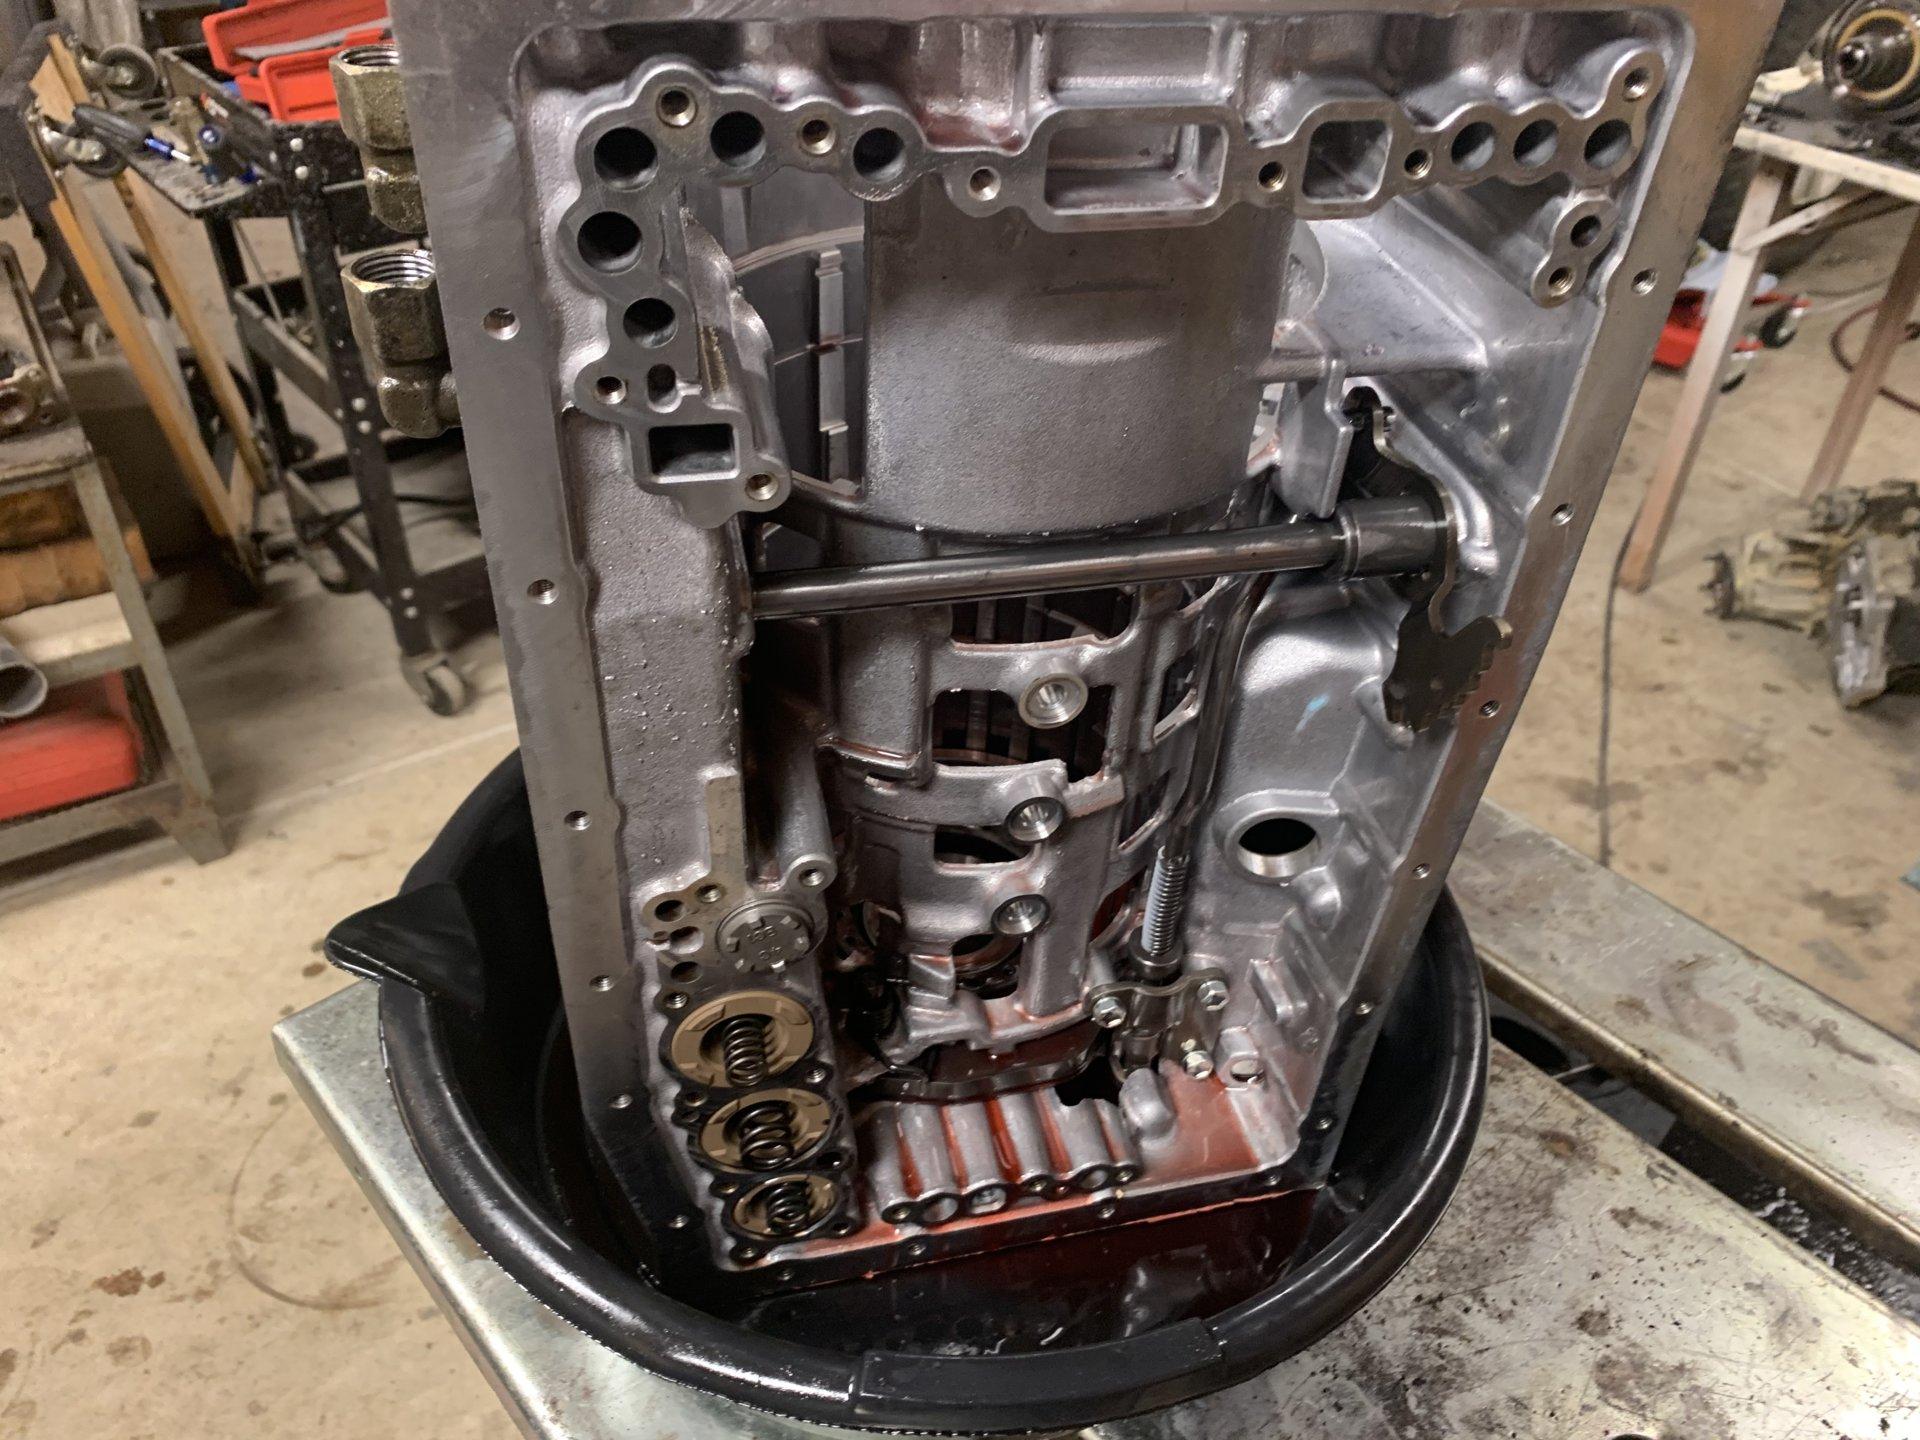 Replacing my '03 LX470's Transmission | IH8MUD Forum